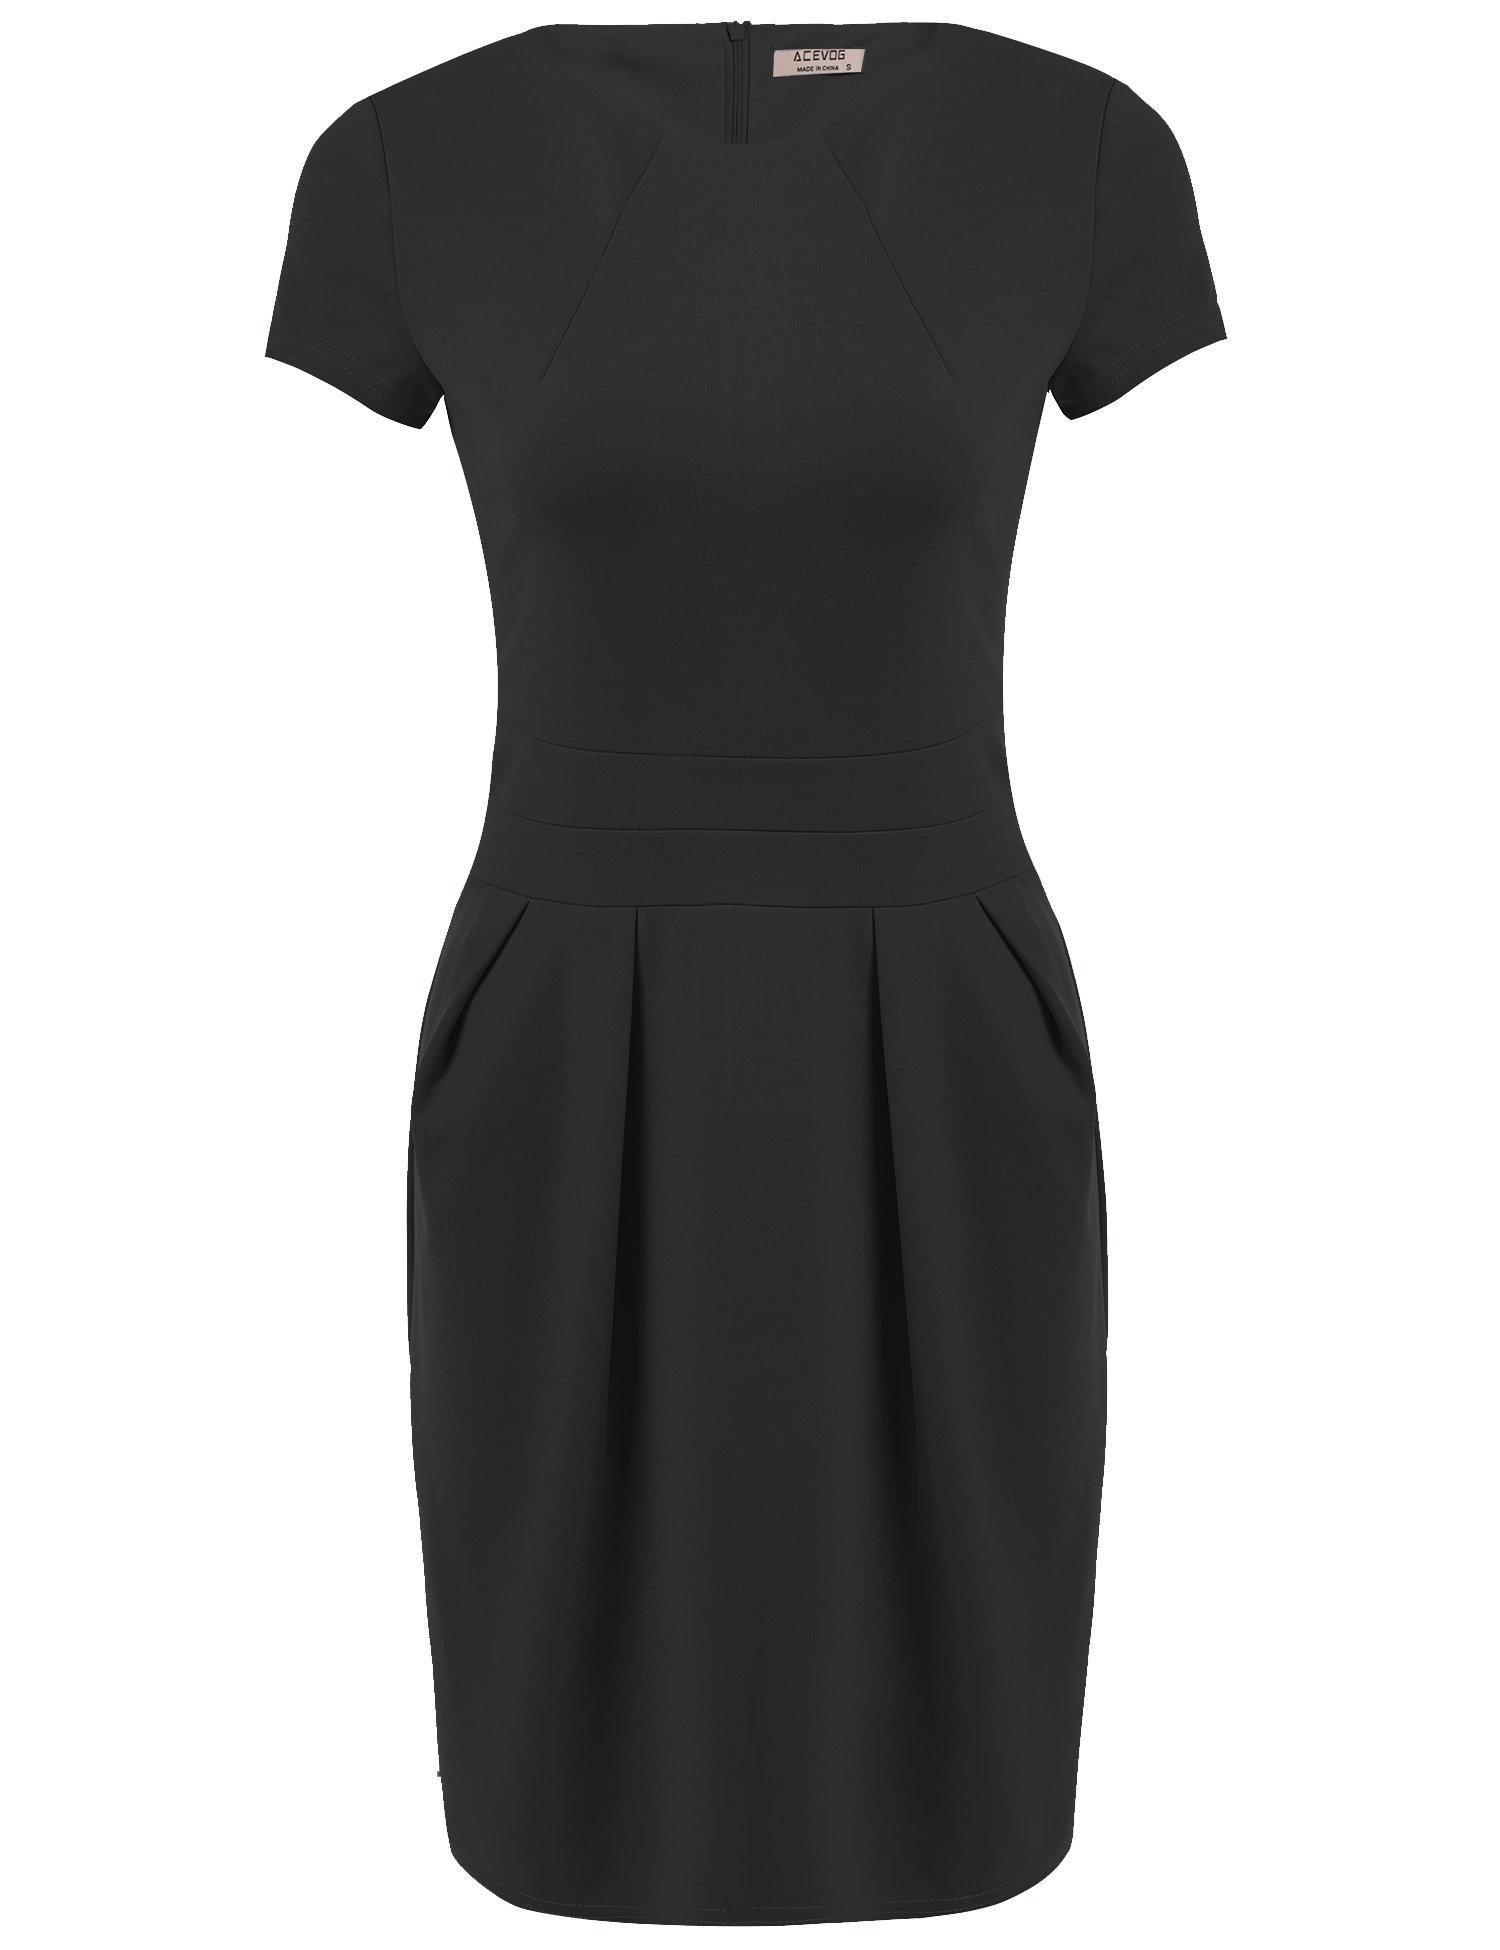 ACEVOG Women's Classic High Short Sleeve Work To Wear Pencil Office Dresses (Medium, Black)